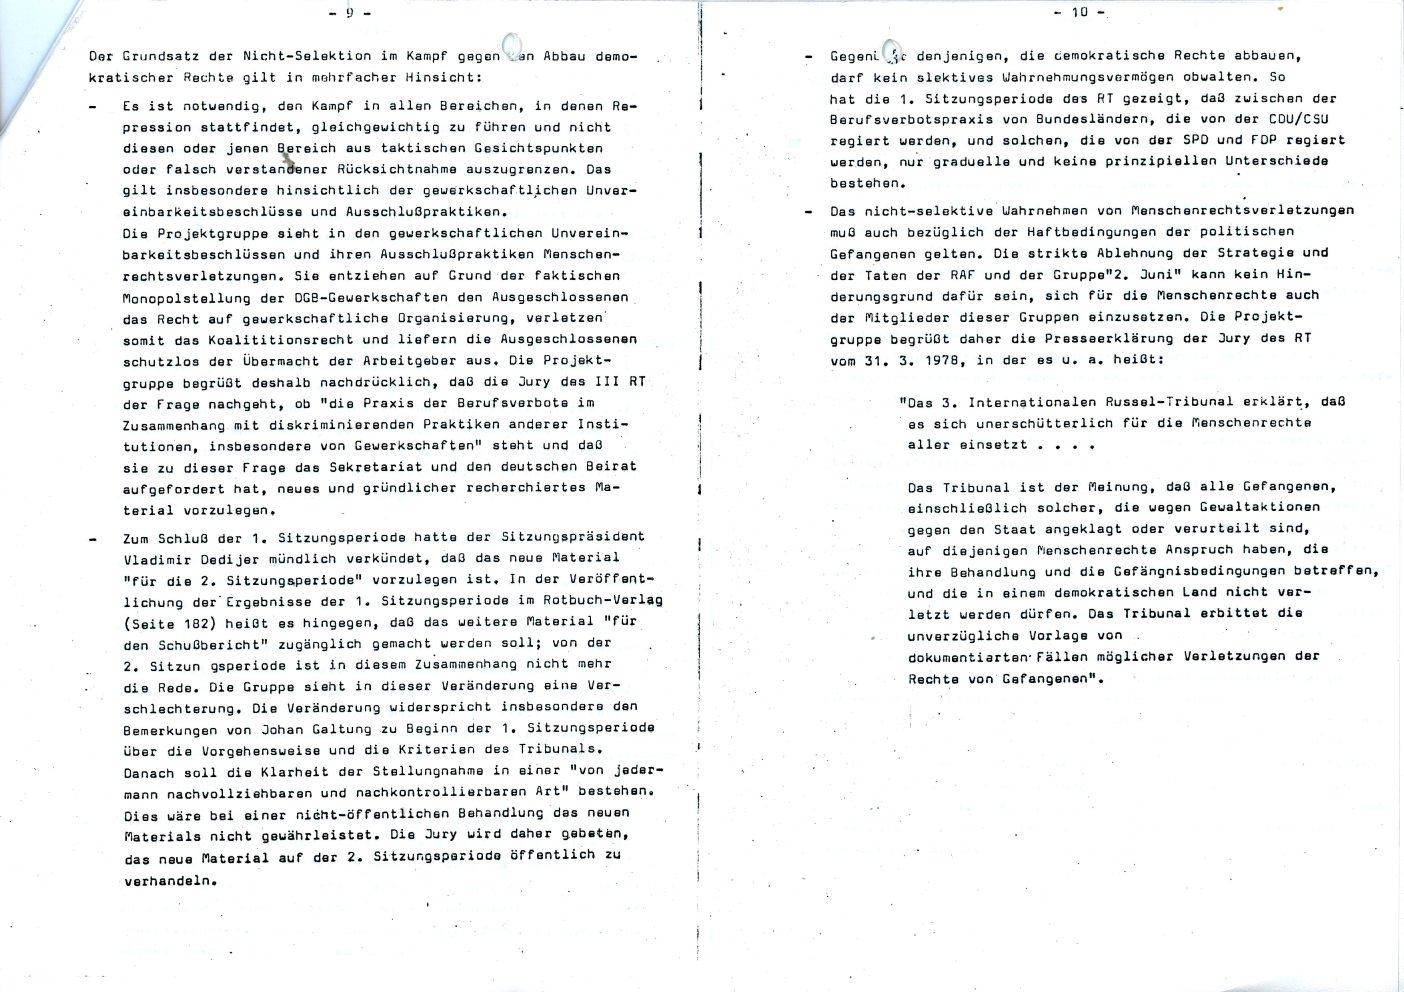 Frankfurt_Projektgruppe_RT_19780614_05